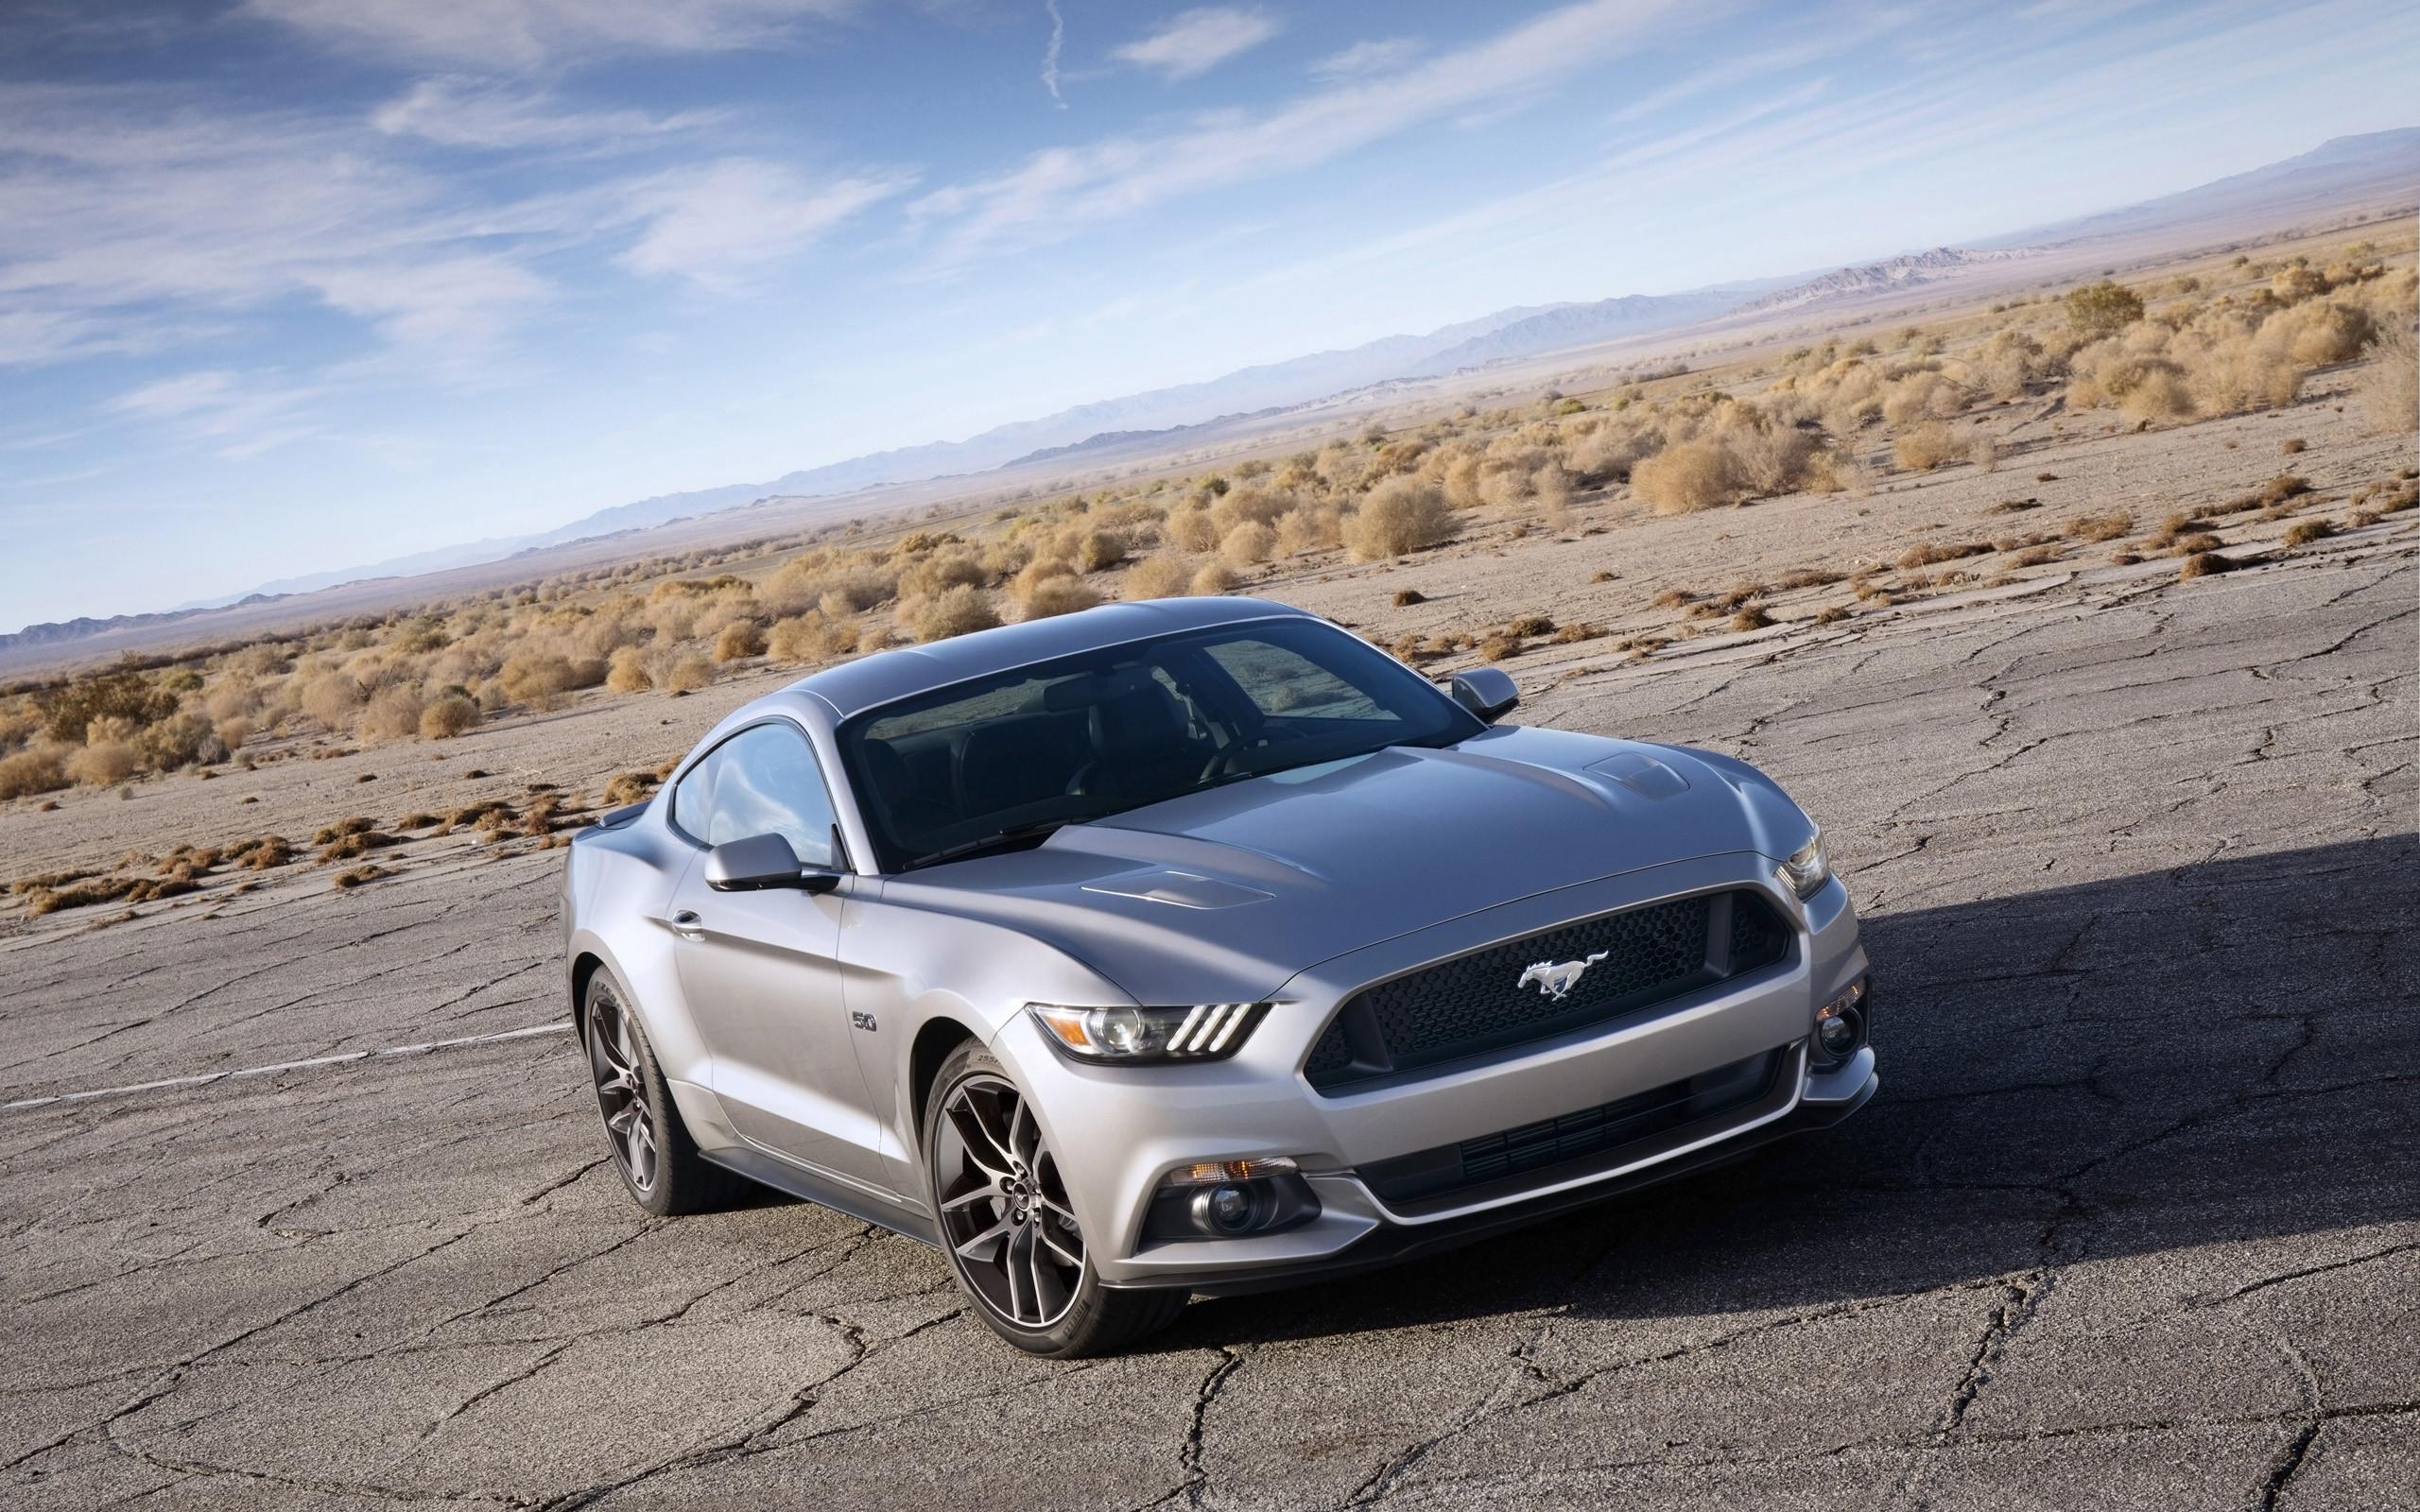 2015 Ford Mustang Wallpaper HD 1662